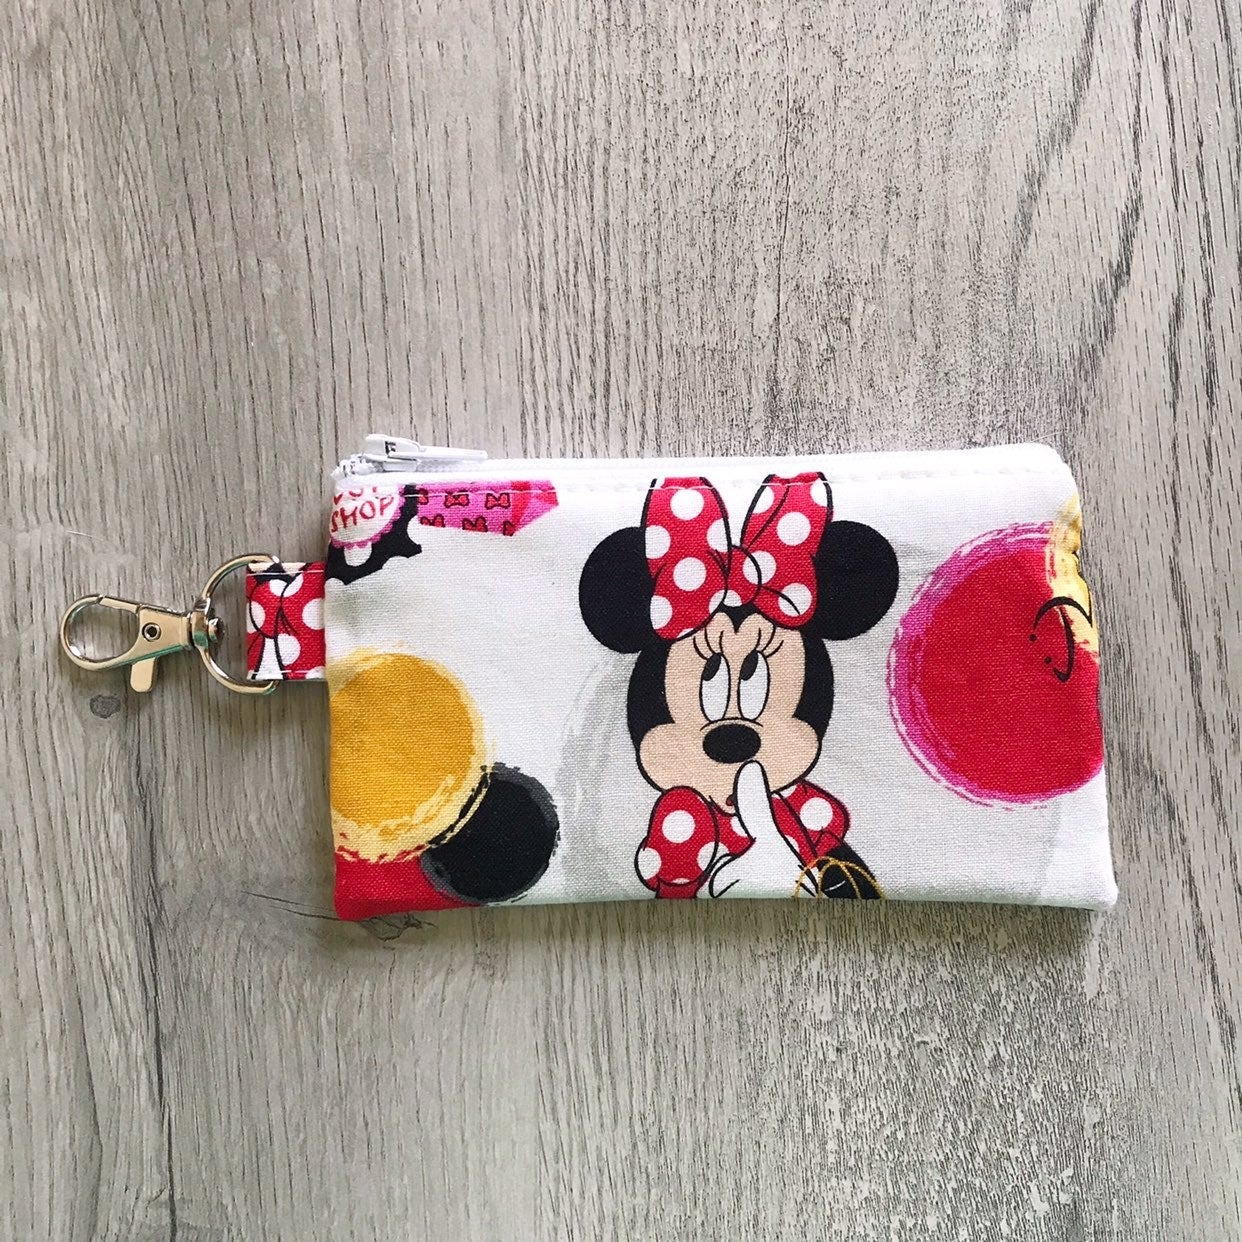 Minnie Mouse Zipper Pouch Key chain